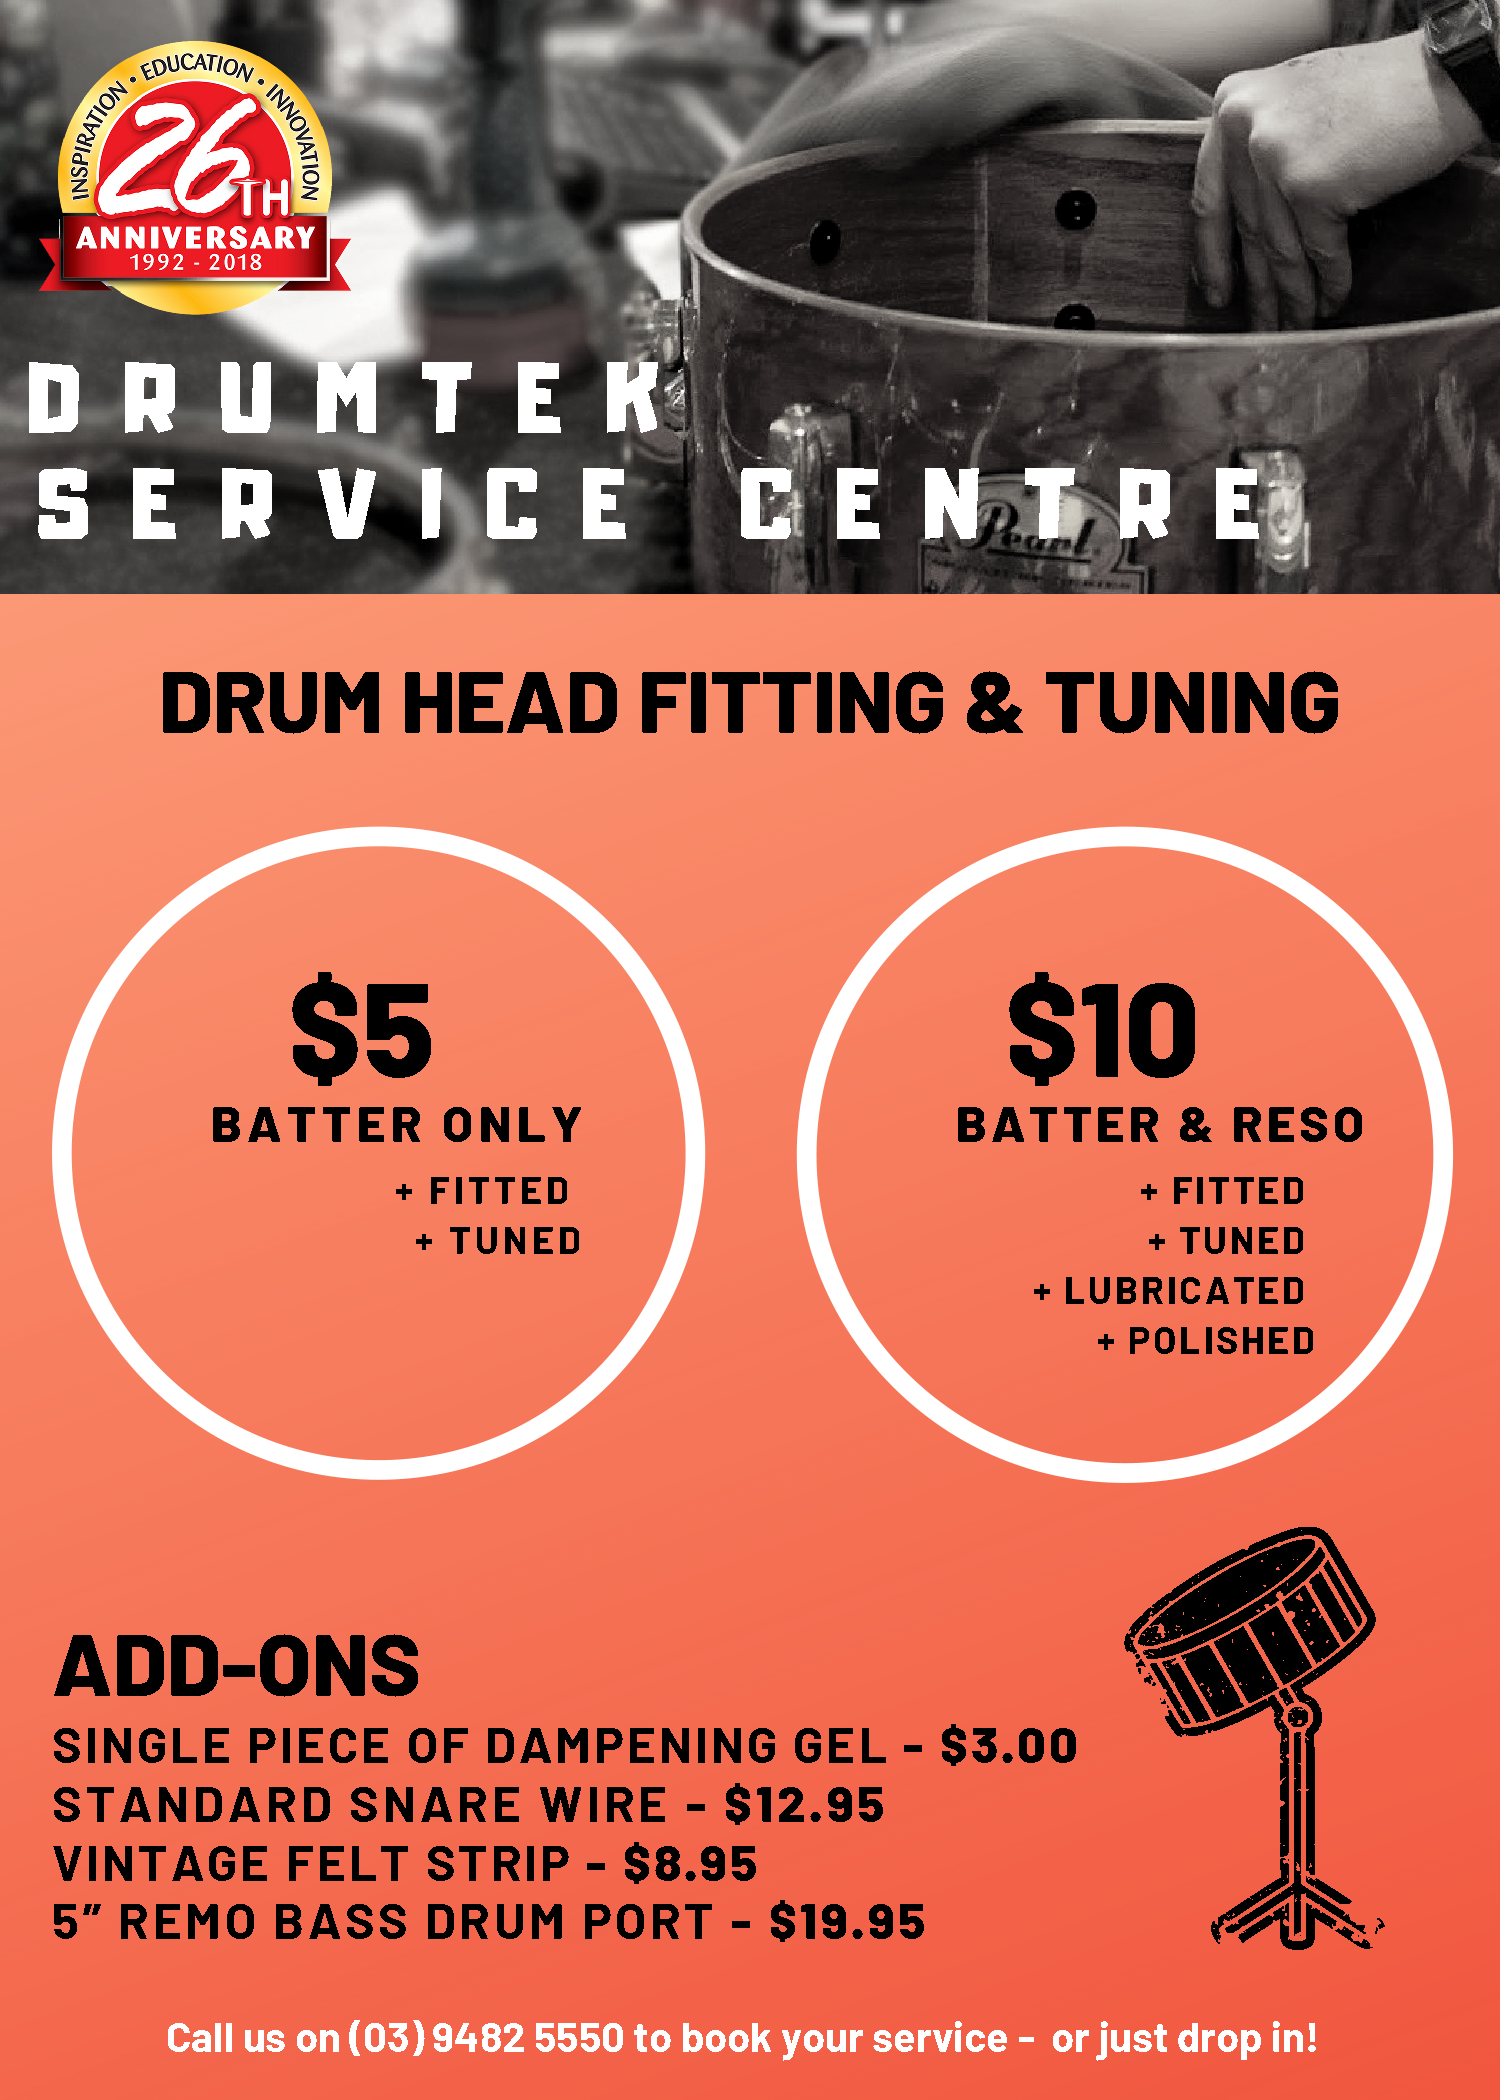 drumtek-service-centre-1-.png